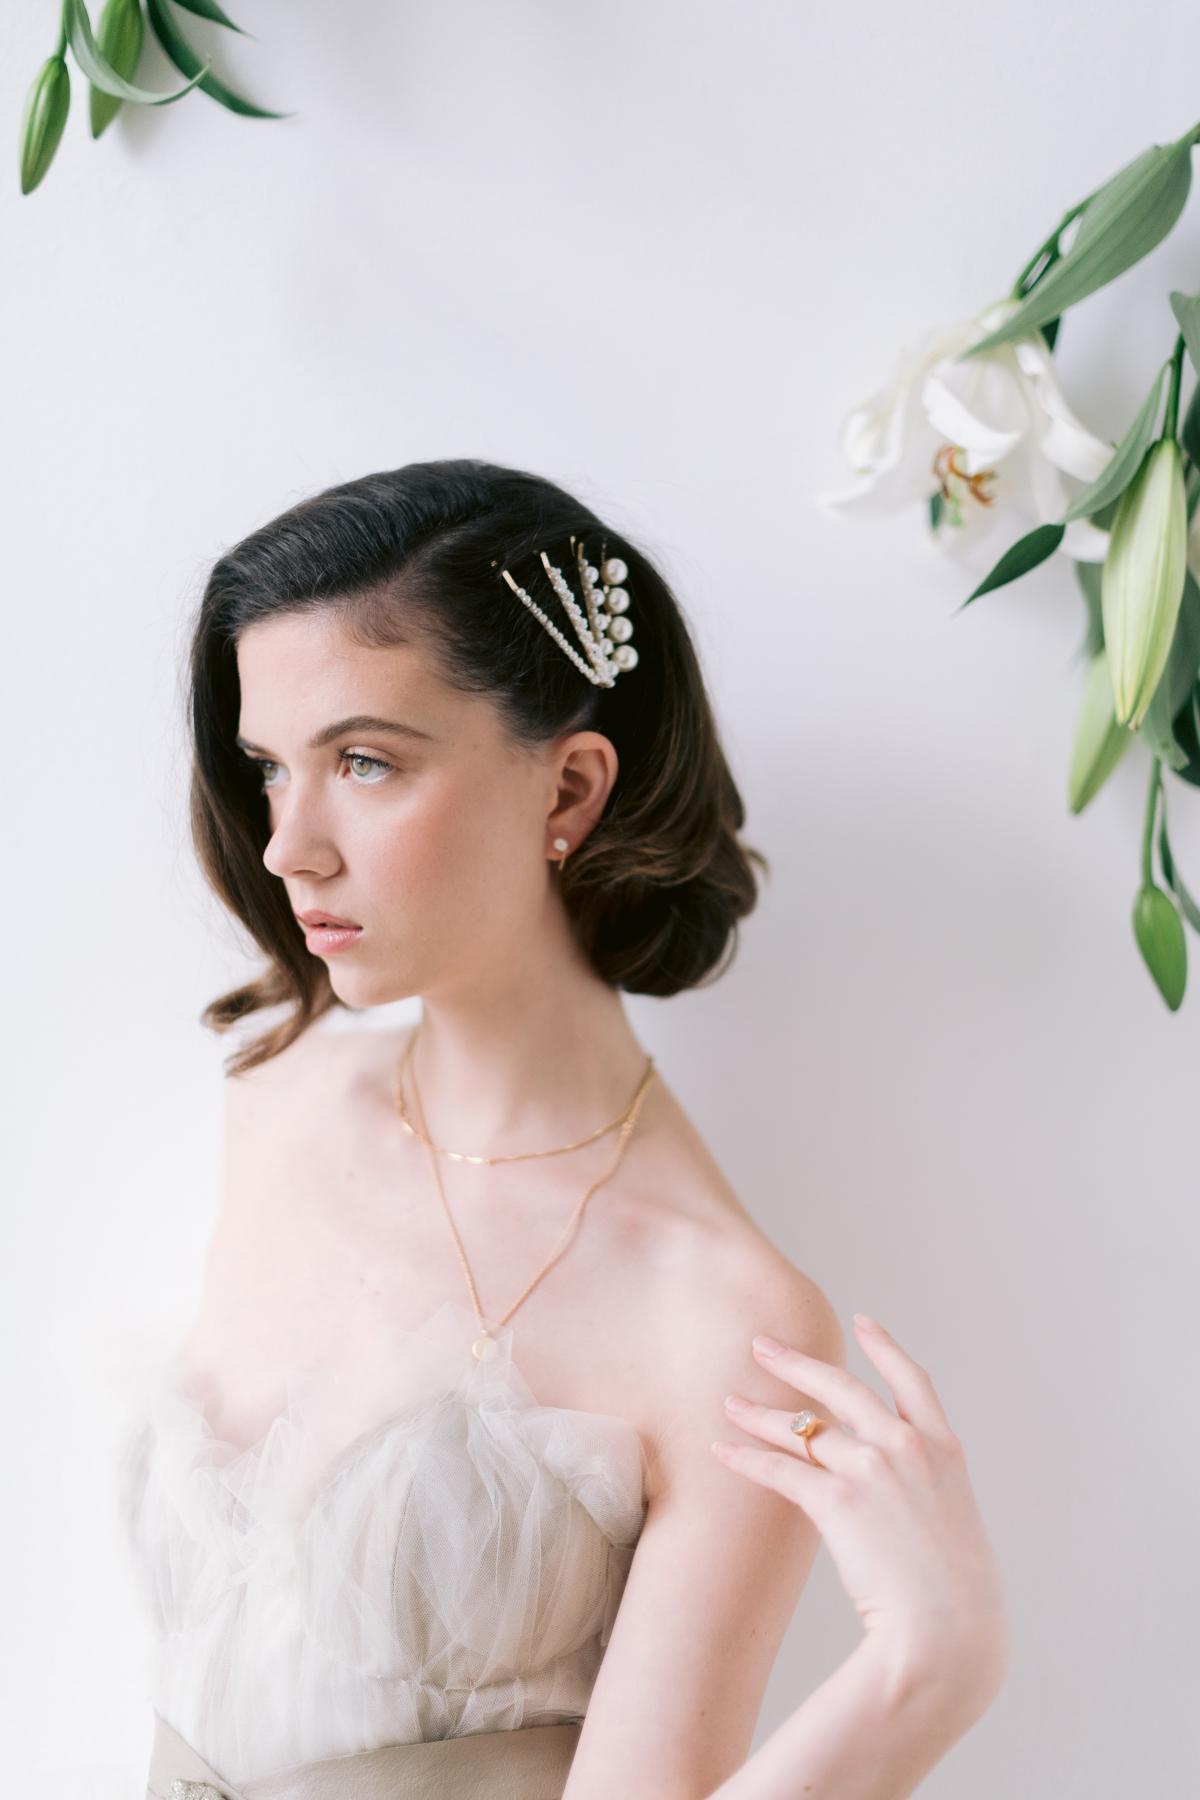 Laura Lanzerotte Bridal Danielle Heinson Photography 18